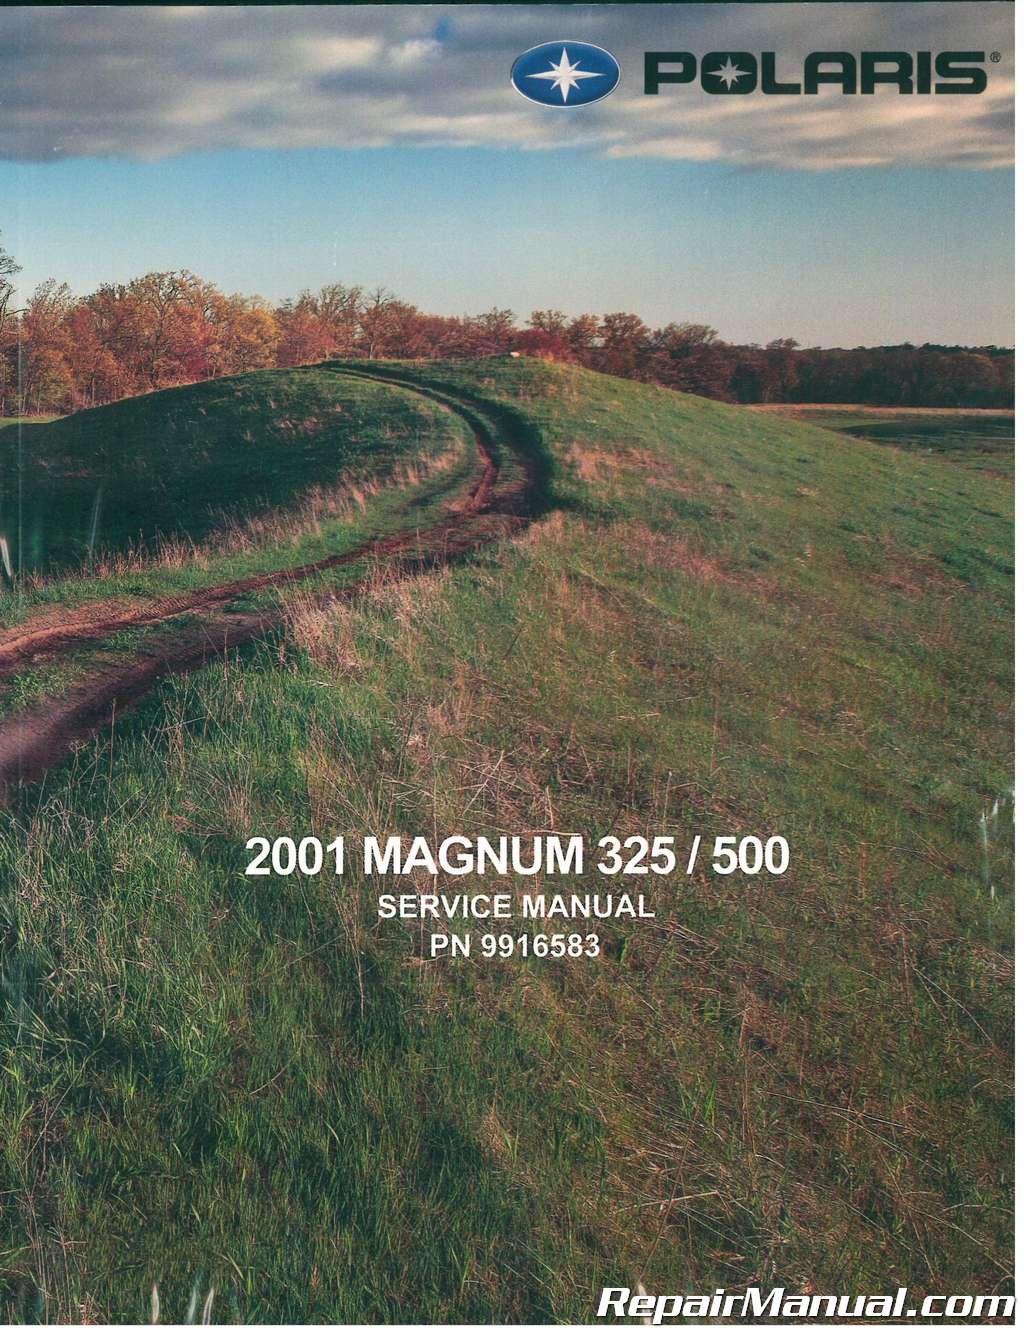 2001 Polaris Magnum 325 500 Atv Service Manual Sportsman Awd Wiring Diagram